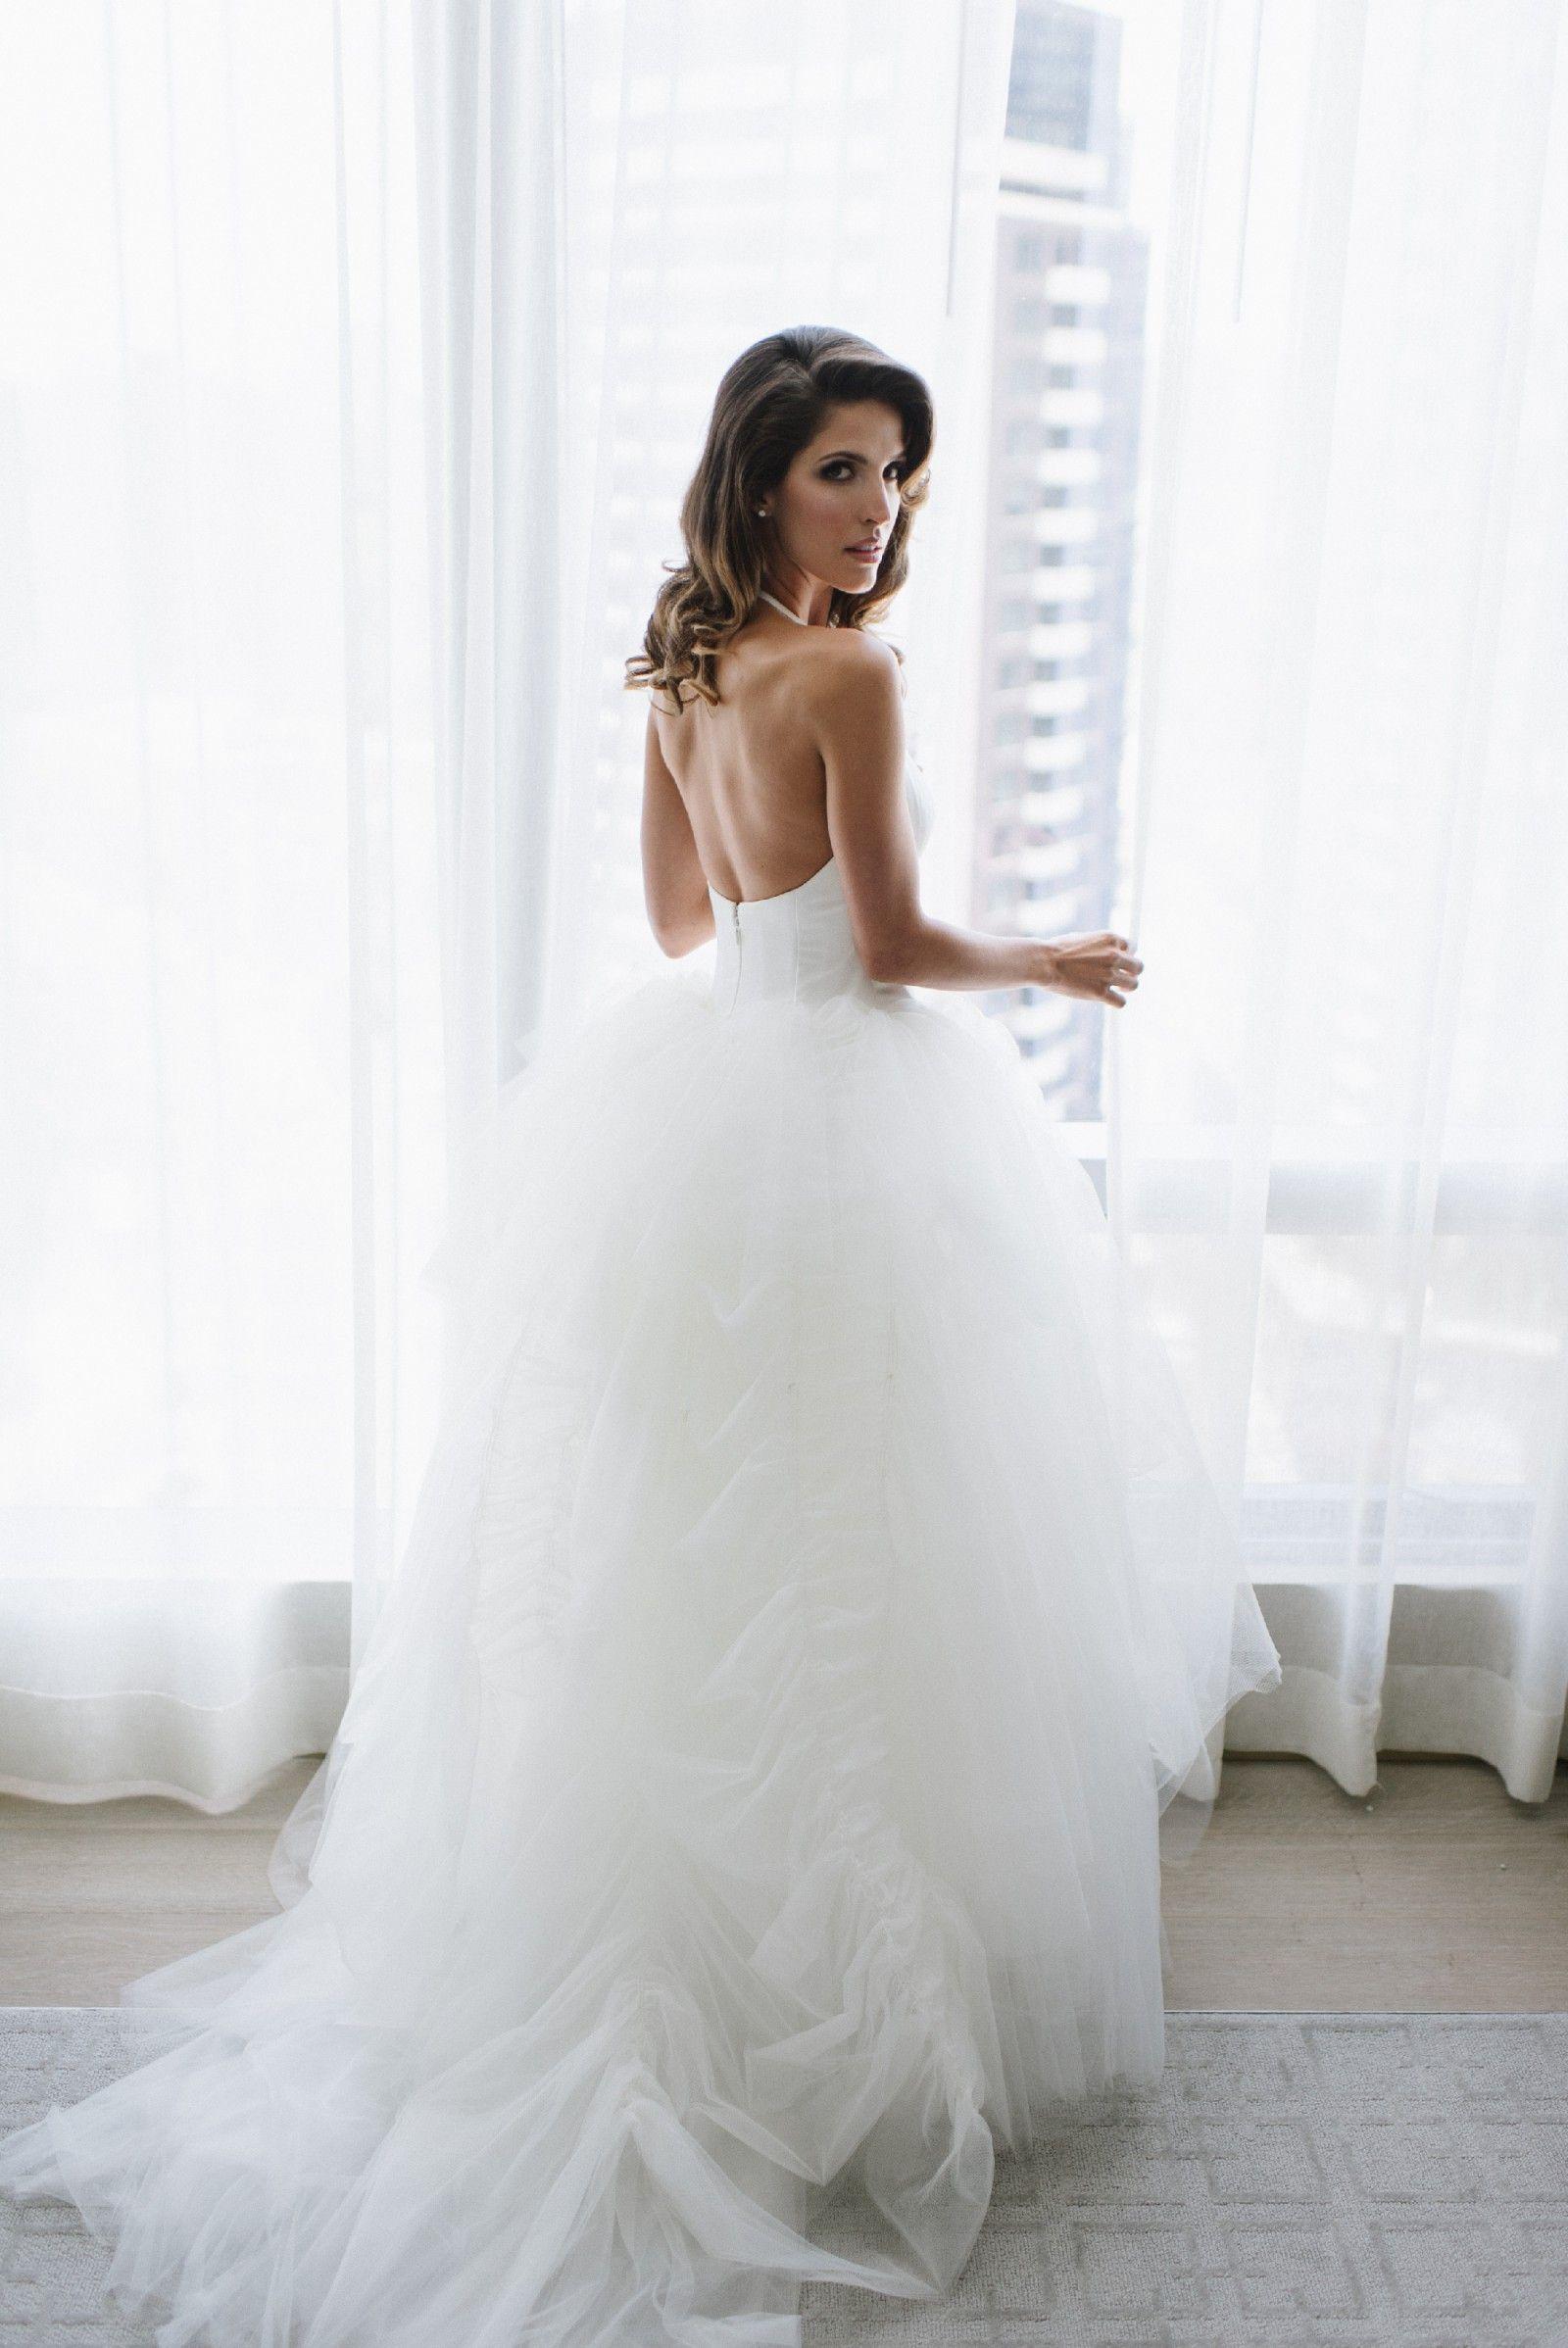 Vera Wang, ODETTE, Size 6 Wedding Dress